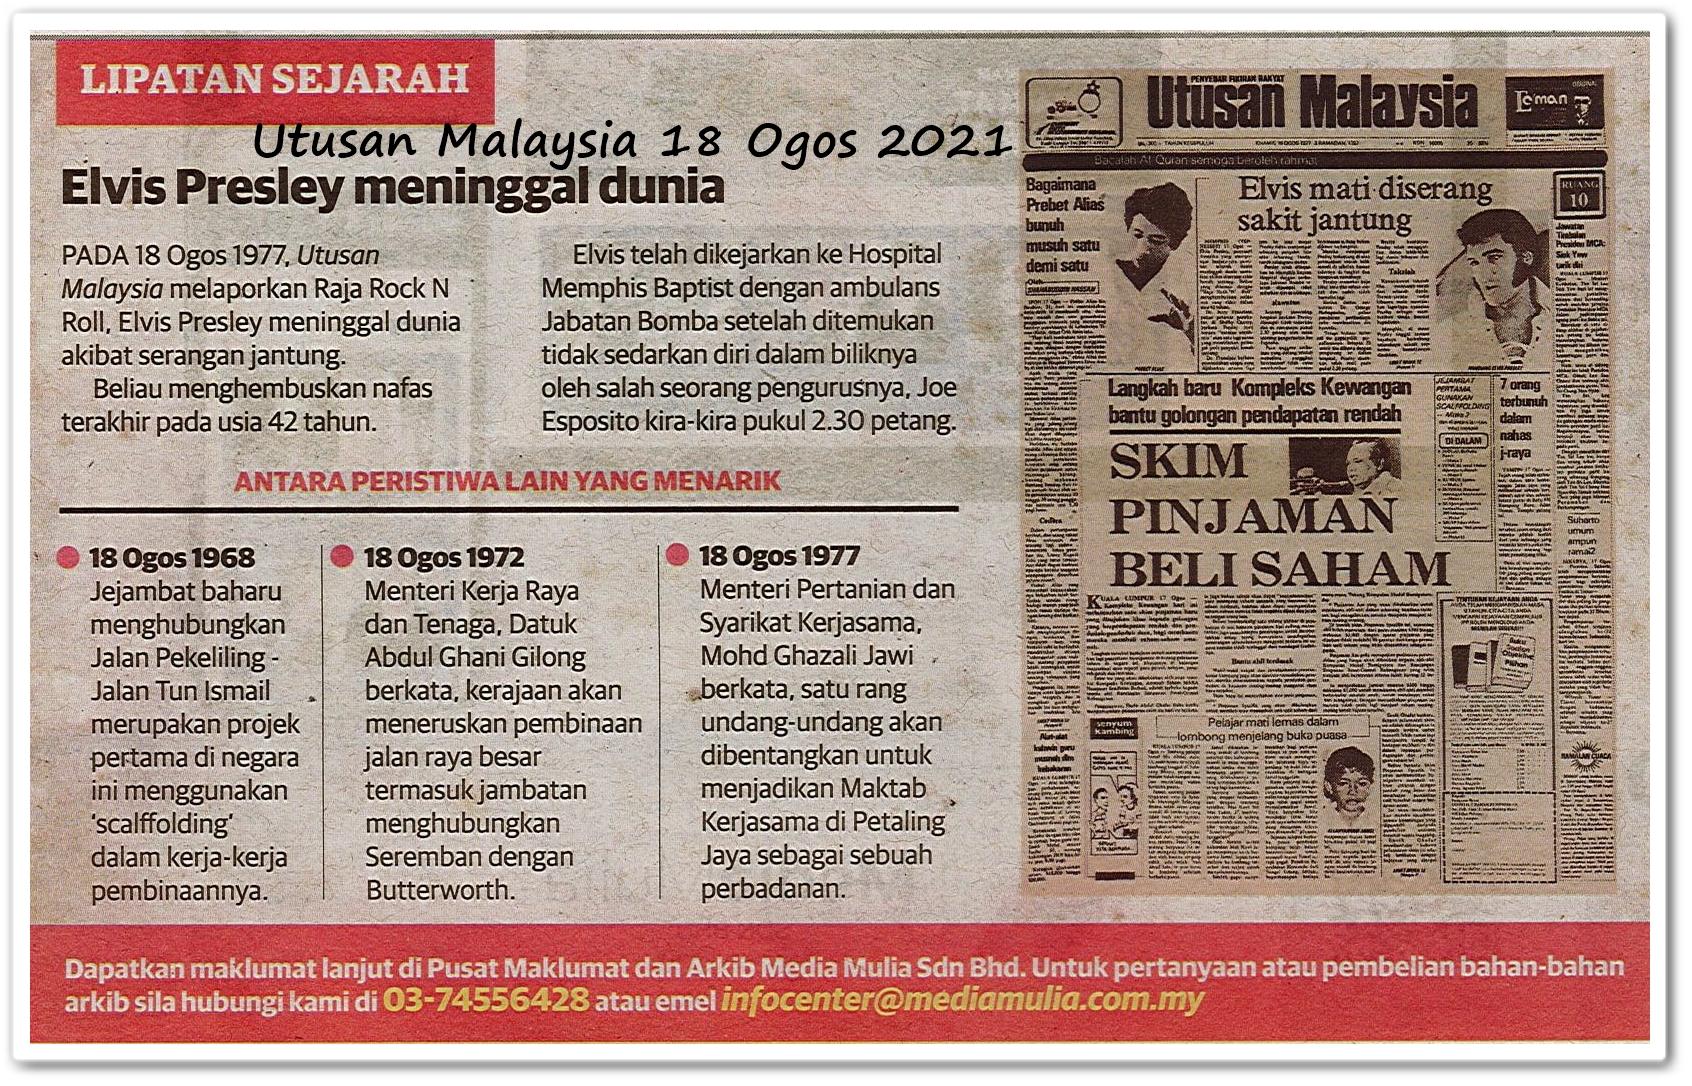 Lipatan sejarah 18 Ogos - Keratan akhbar Utusan Malaysia 18 Ogos 2021